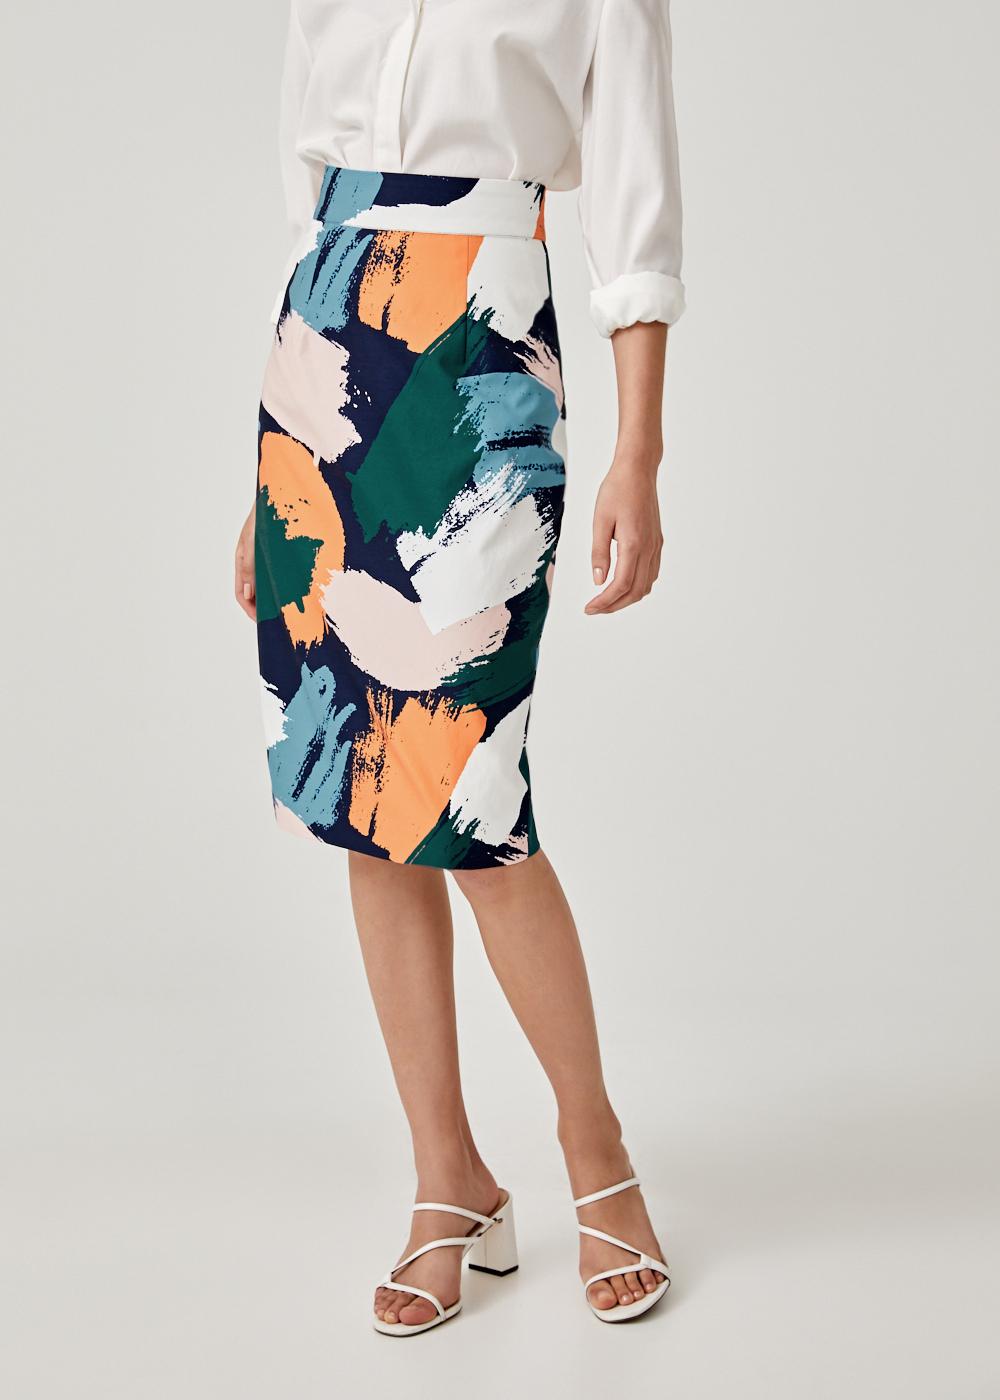 Laurensa Pencil Skirt in Artful Delight